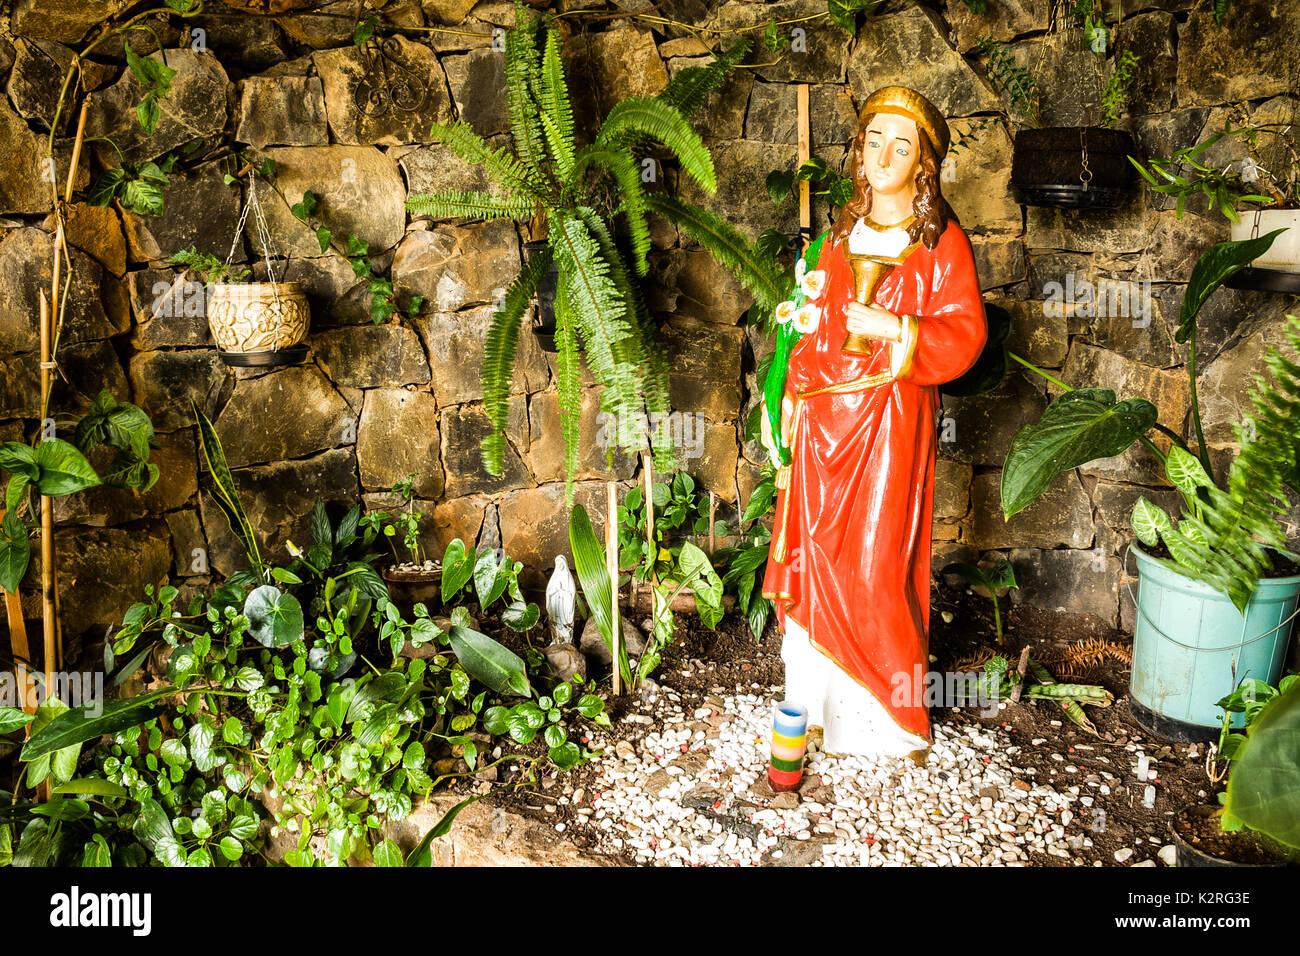 Santa Luzia Sanctuary at Santa Lucia Square. Novo Horizonte, Santa Catarina, Brazil. Stock Photo